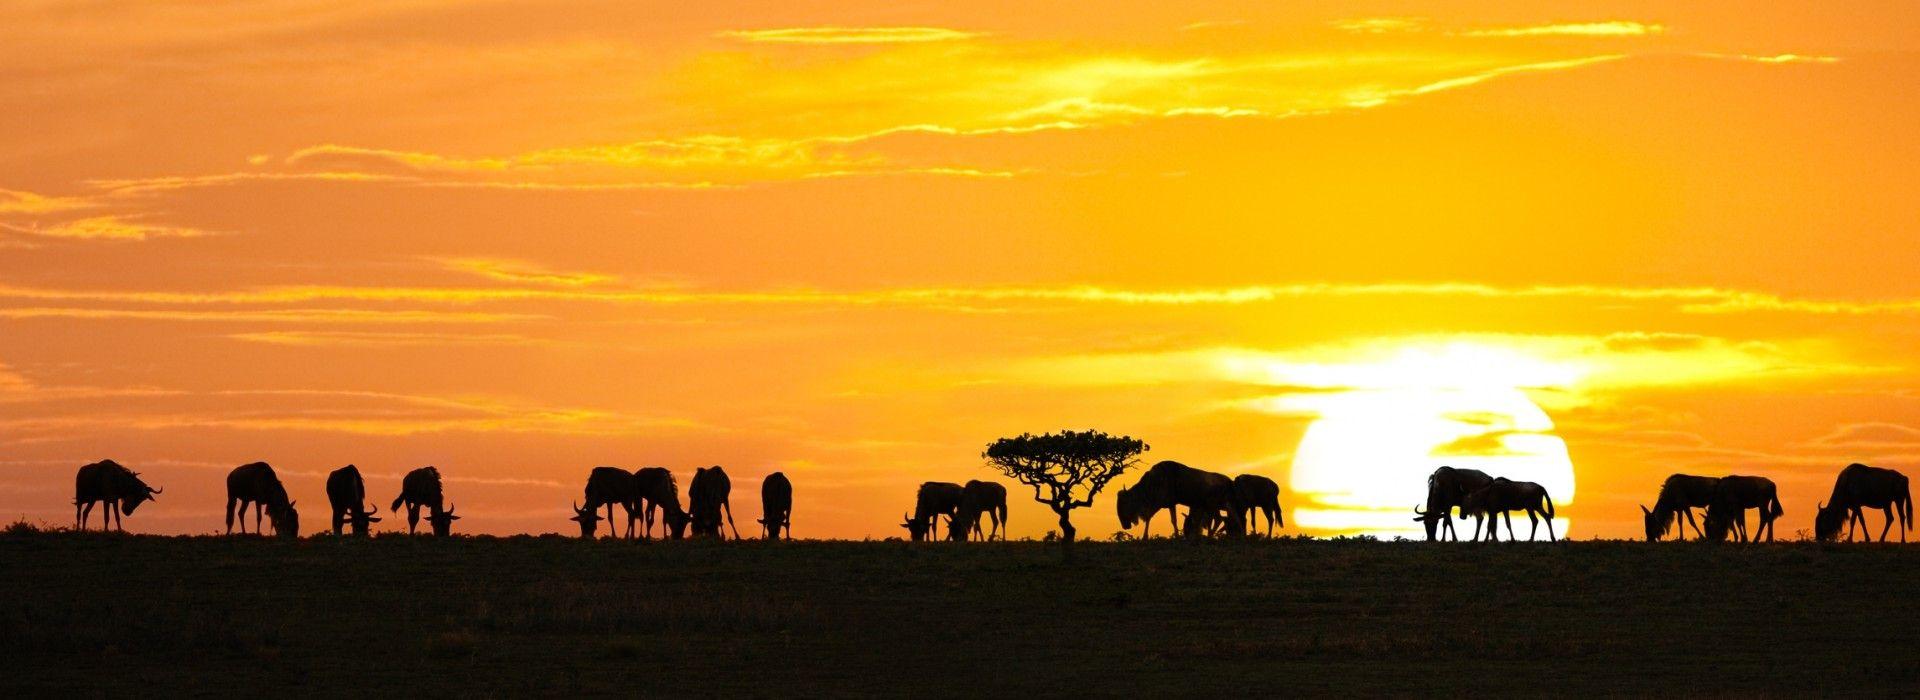 Air tours, road trips and transfers in Kilimanjaro Marangu Route